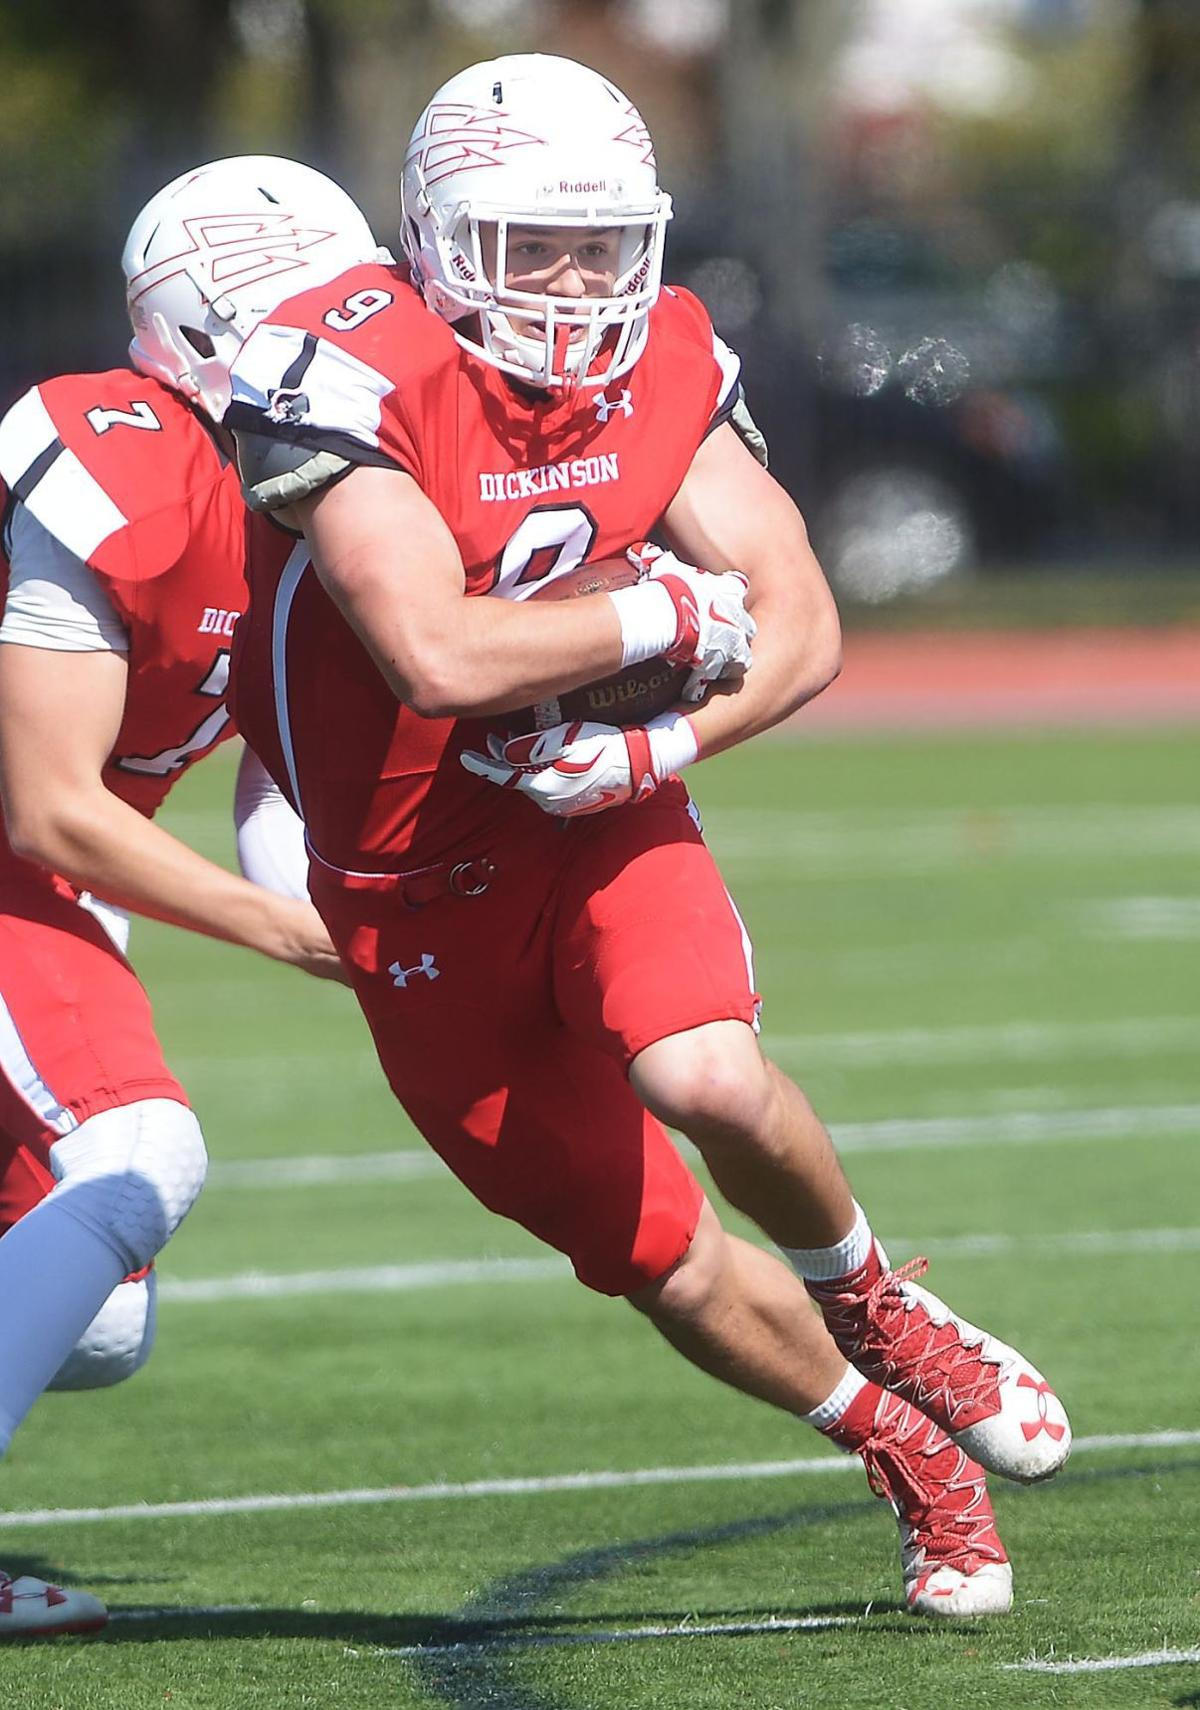 College Football: McDaniel at Dickinson (copy)